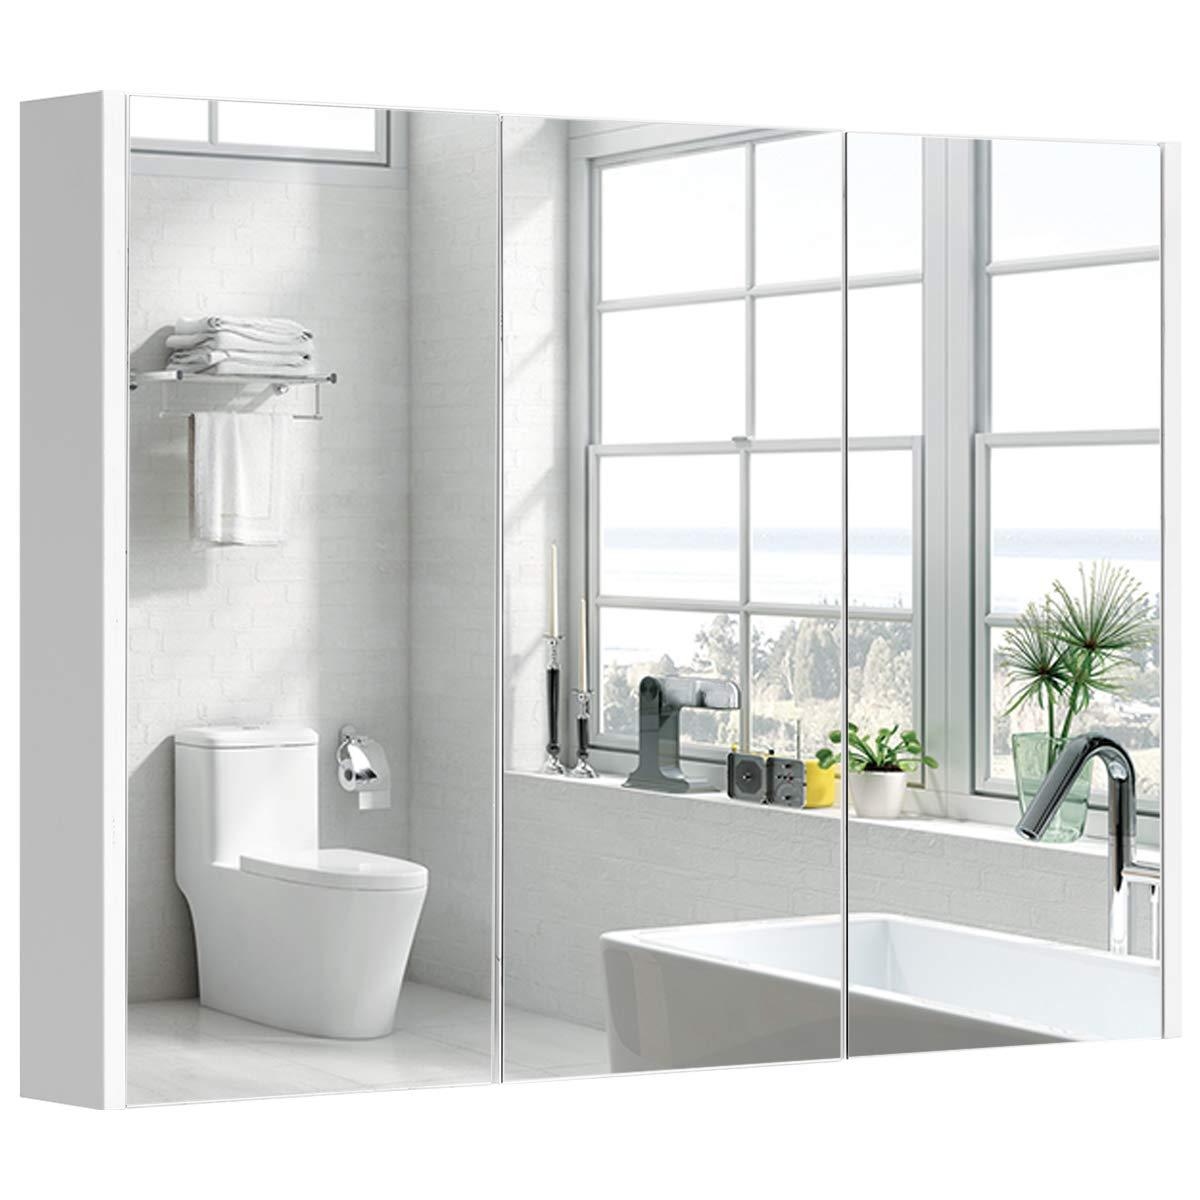 Tangkula Bathroom Medicine Cabinet, Wide Wall Mount Mirrored Cabinet with Adjustable Shelf, Bathroom Triple Mirror Door Cabinet (36'' X25.5X4.5)